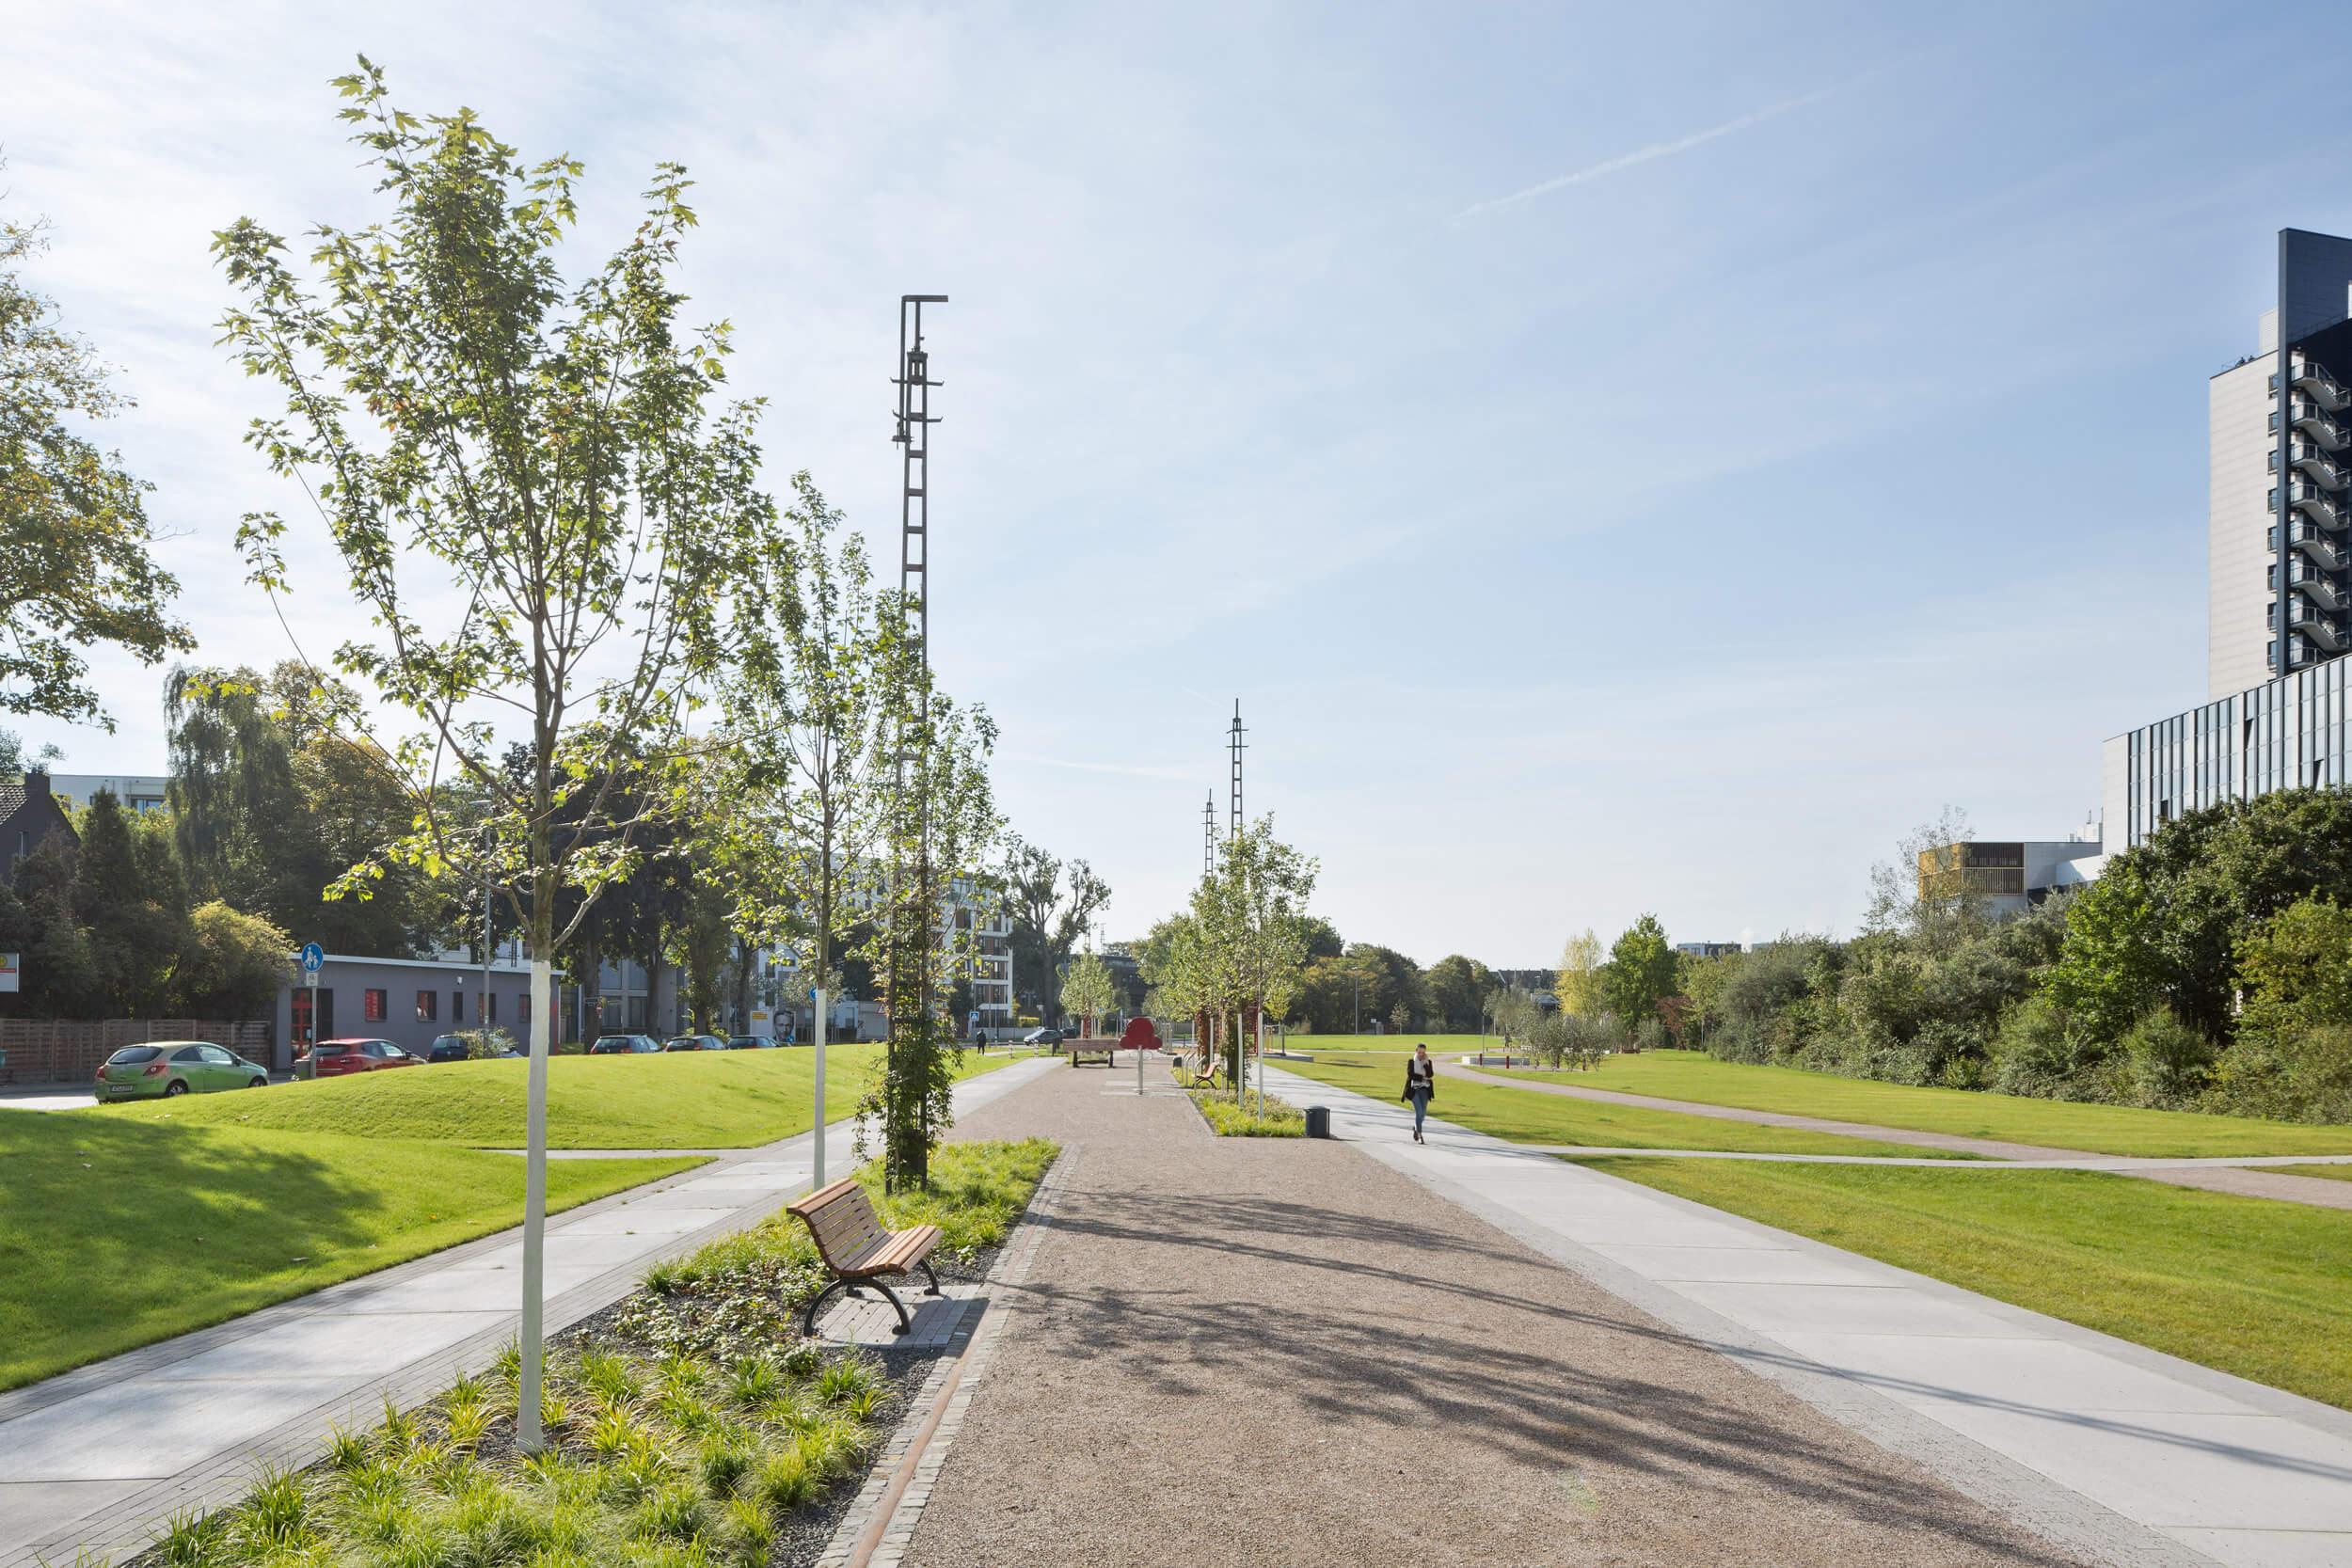 Stadt-Natur-Park Flingern